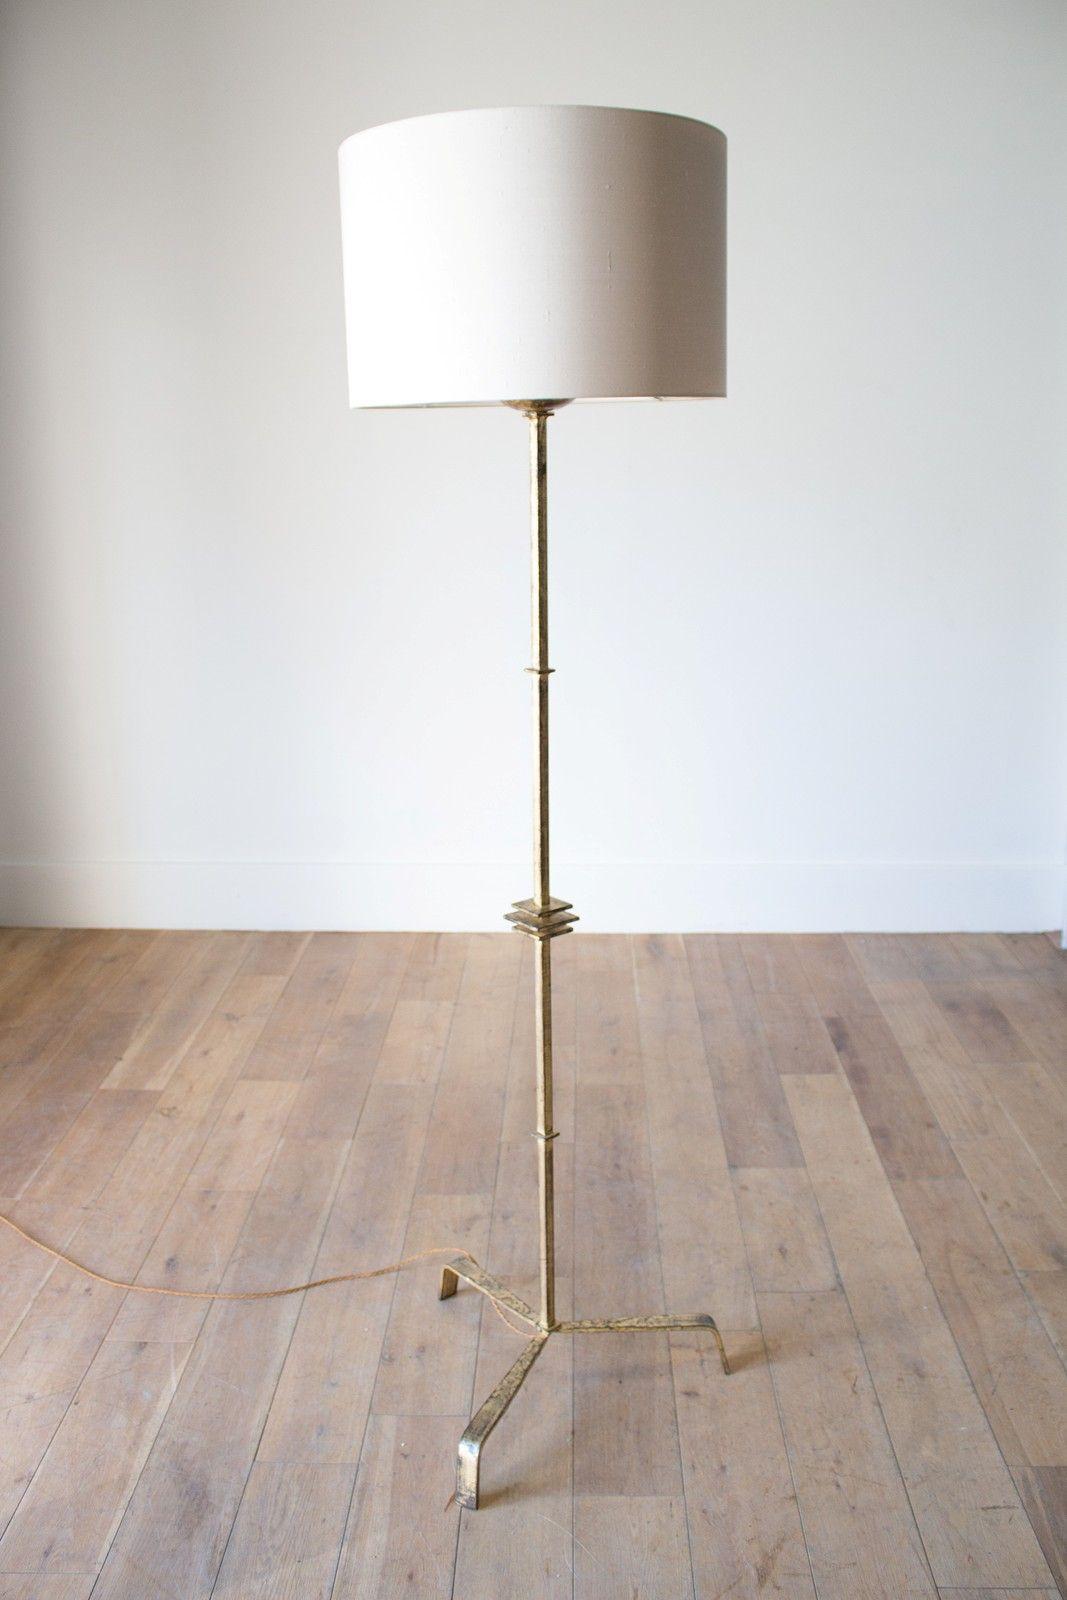 A 1950s Spanish Lamp Stand Seventeen Twentyone